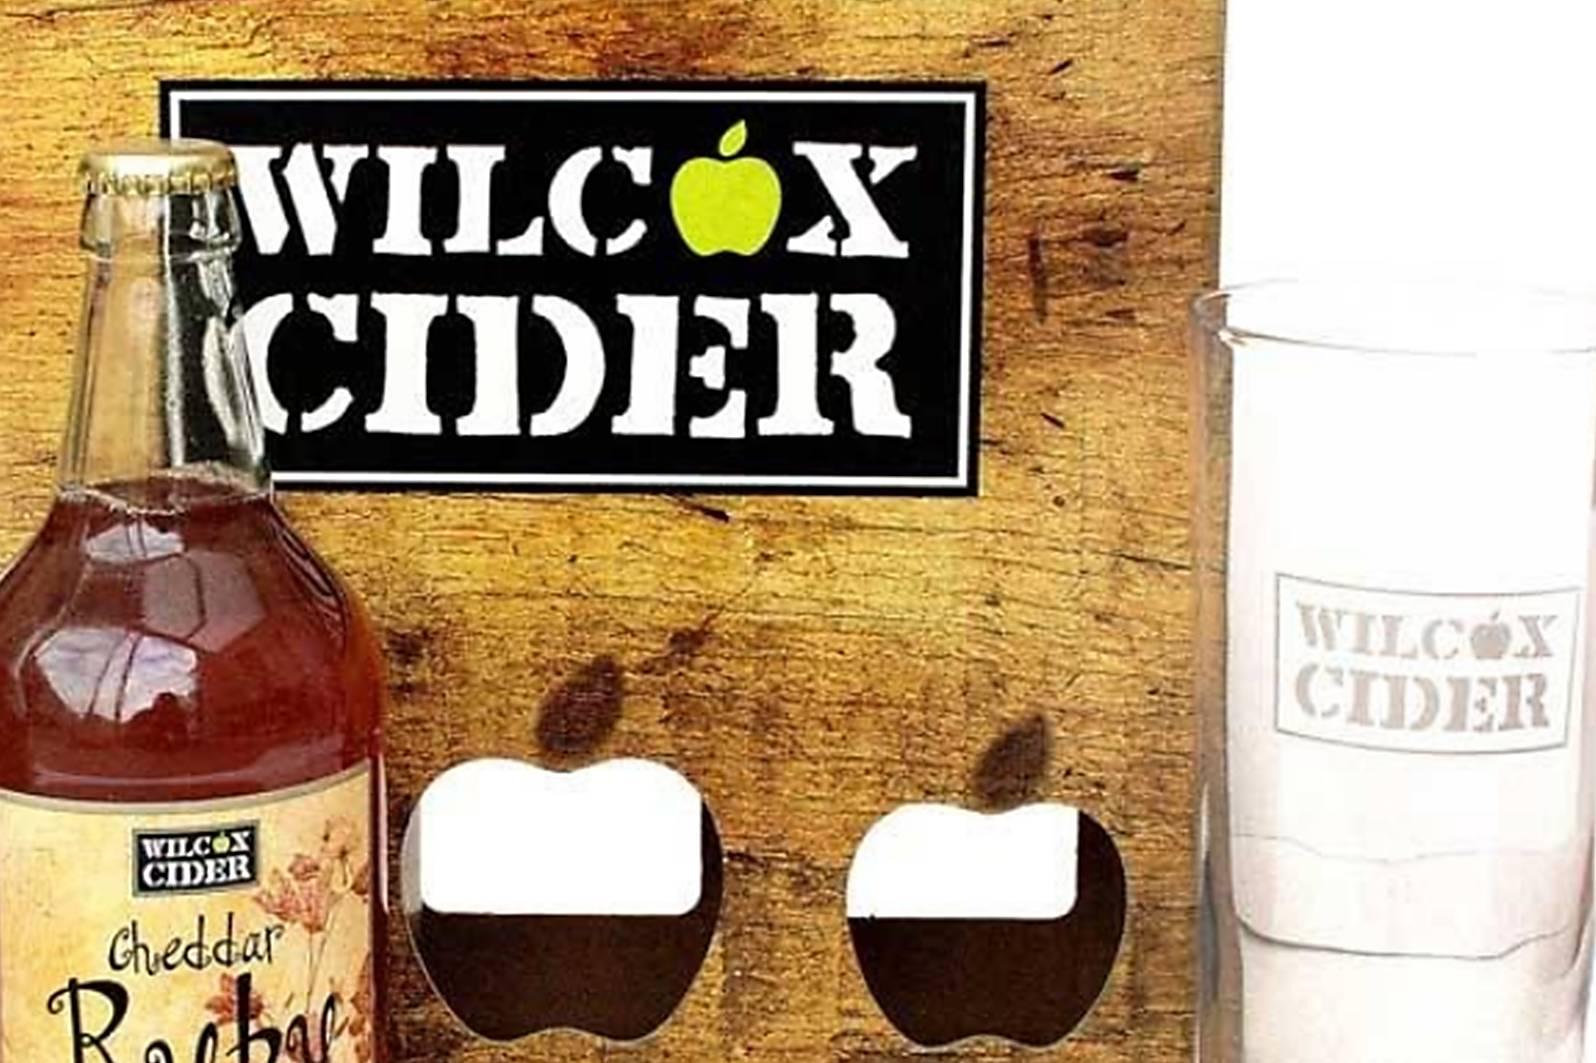 wilcox cheddar cider